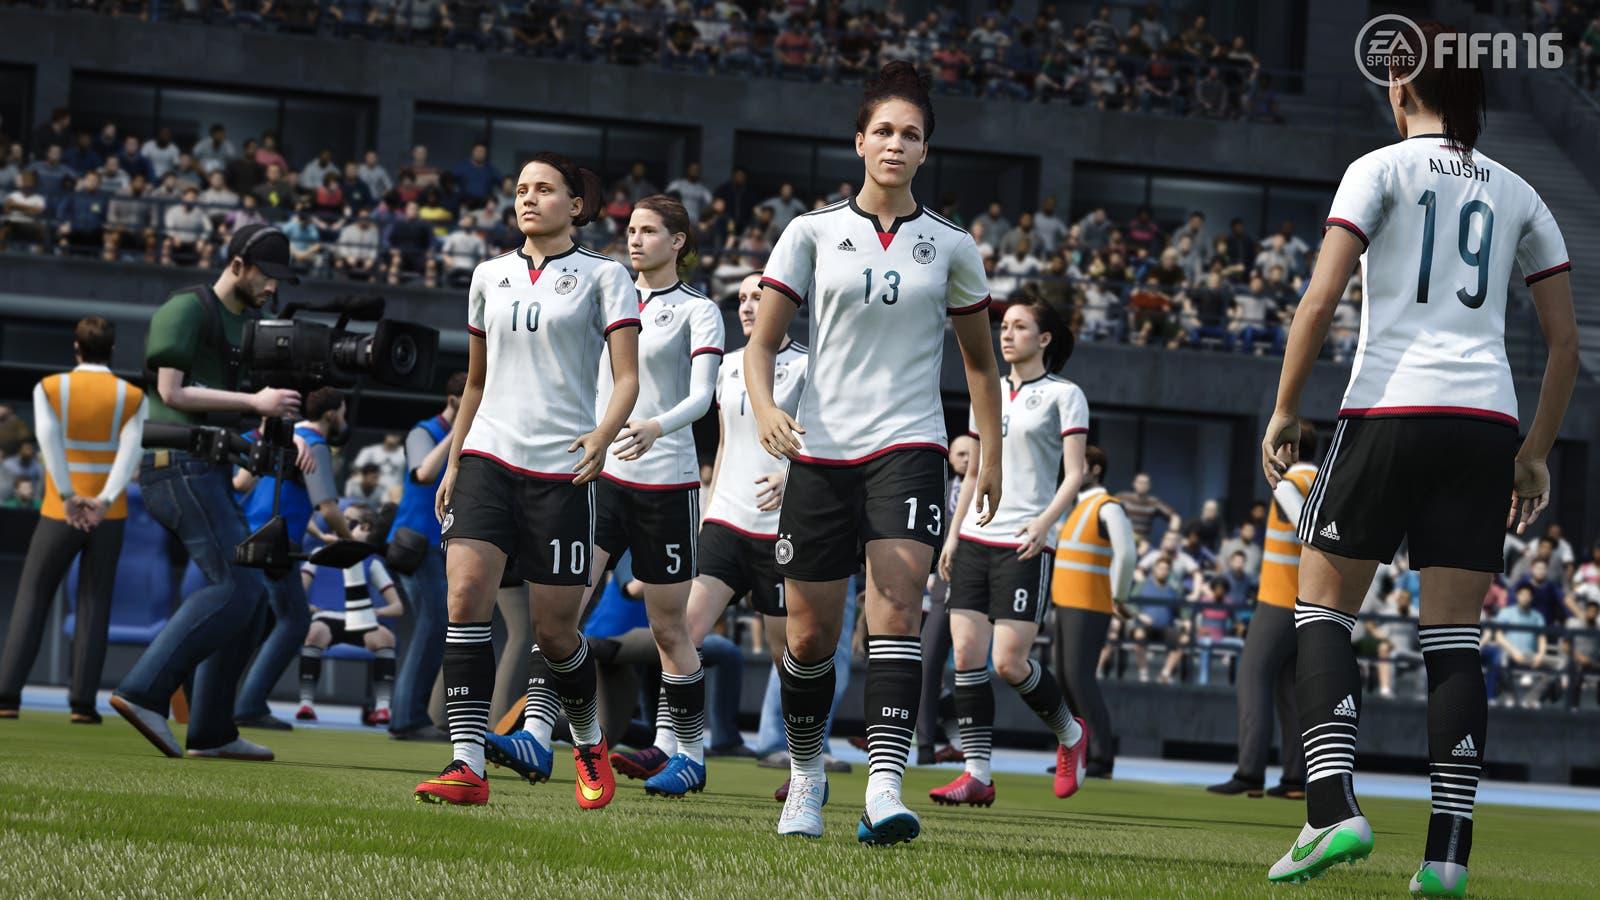 FIFA16_XboxOne_PS4_Women_Germany_LR.jpg